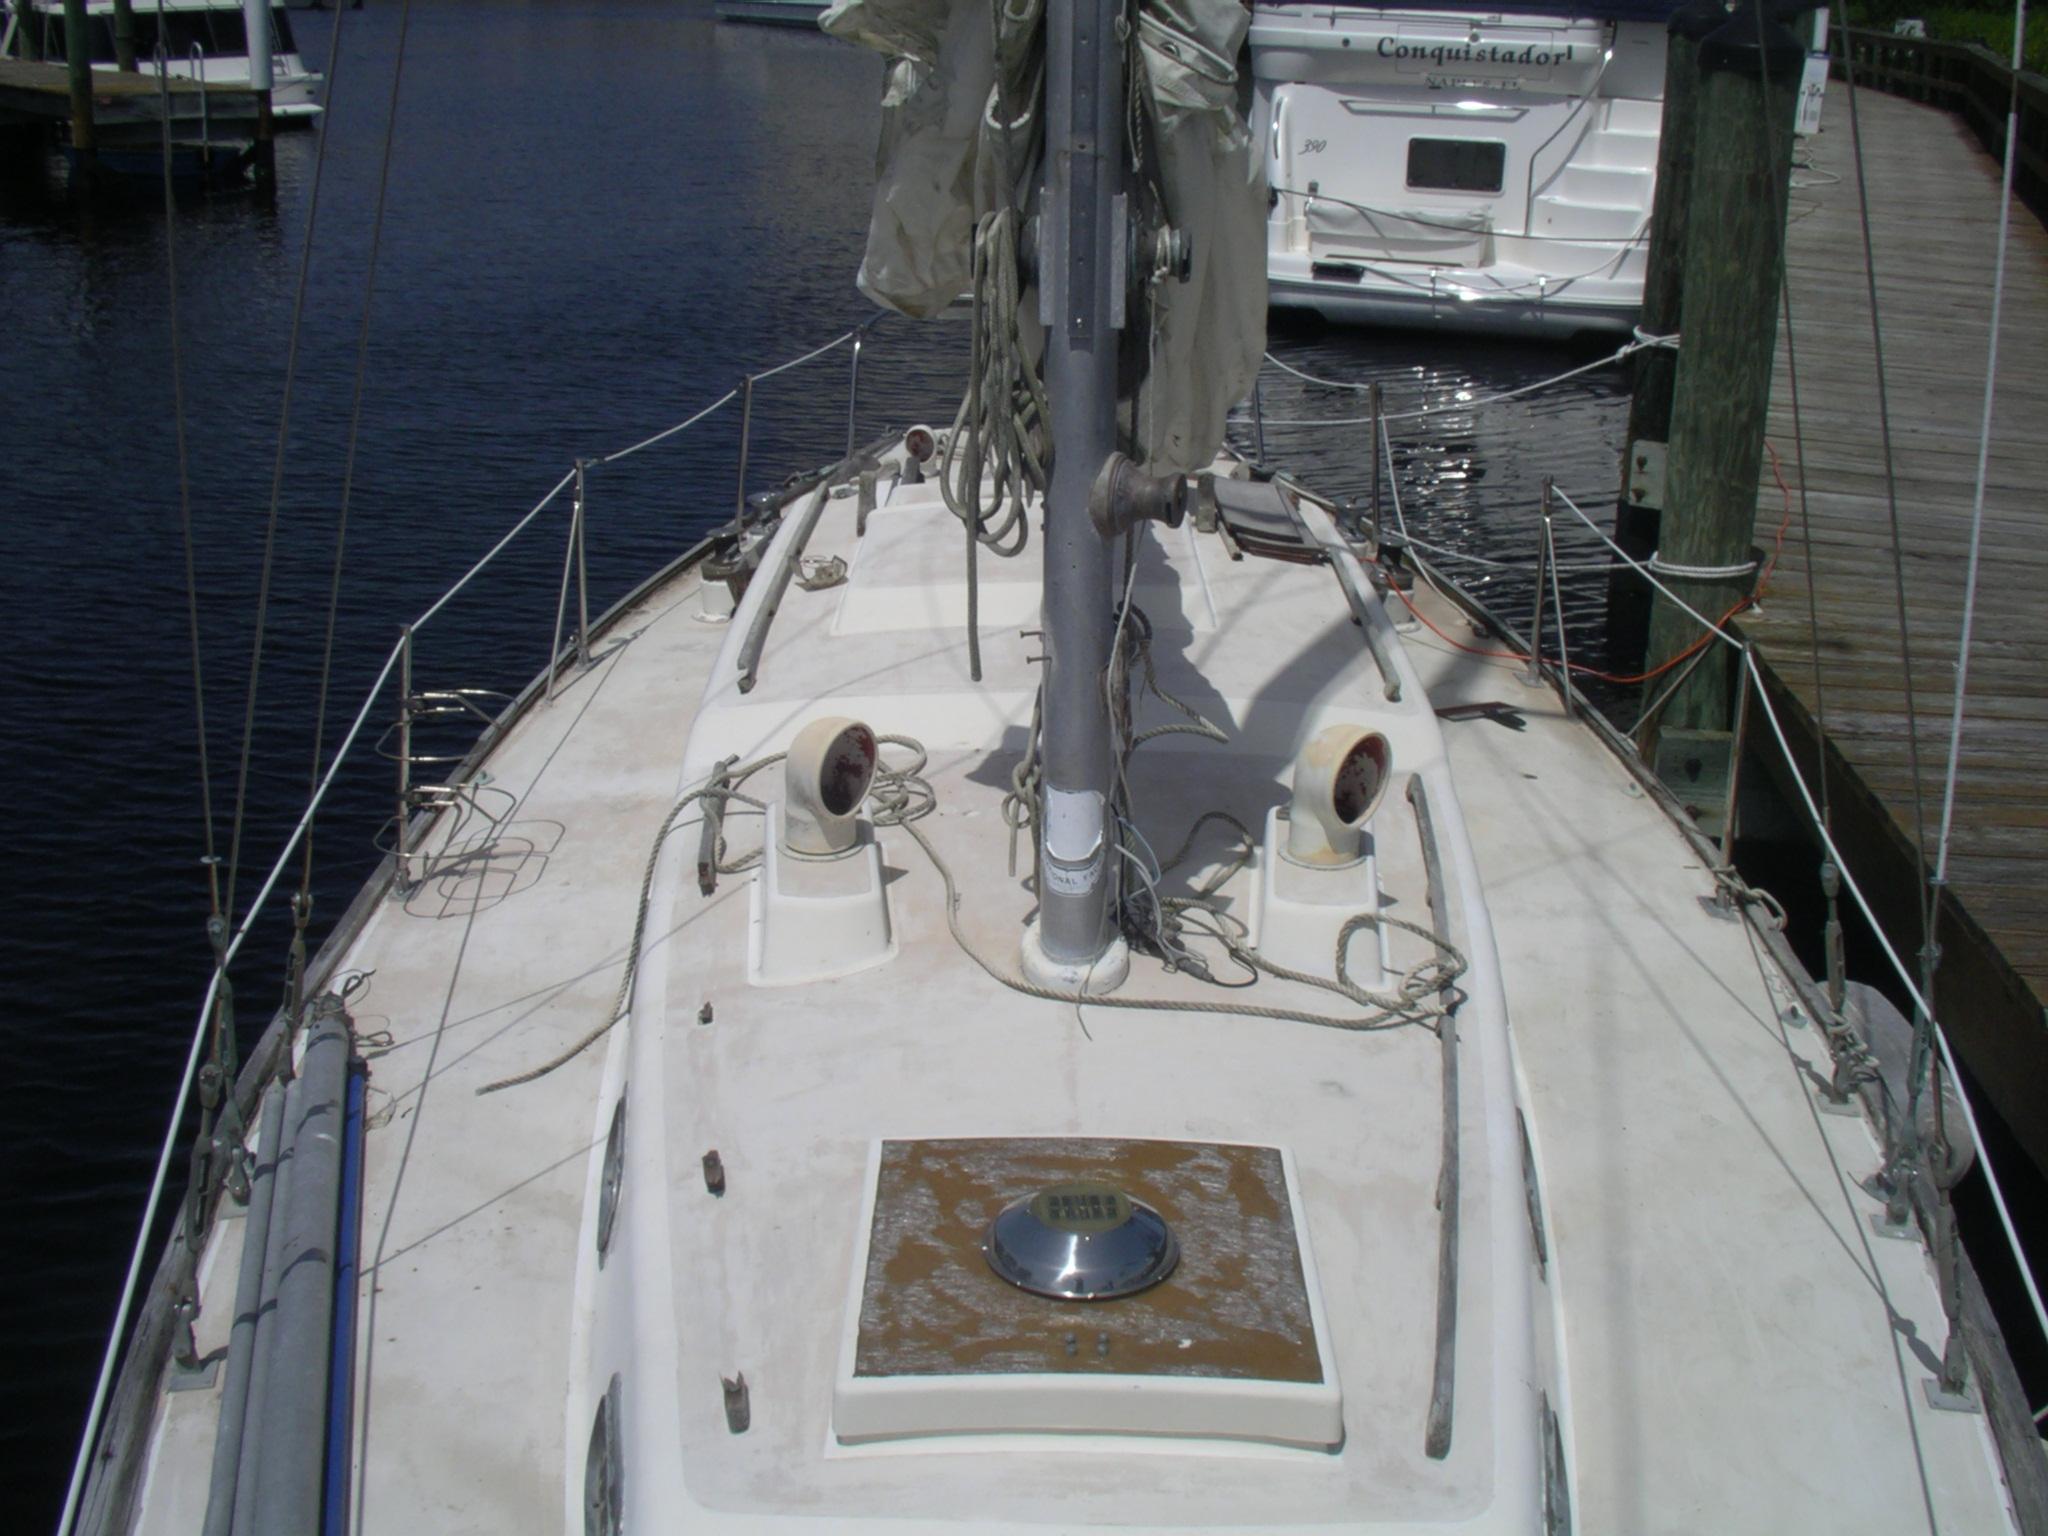 BoatDeck_July2010 (7).JPG